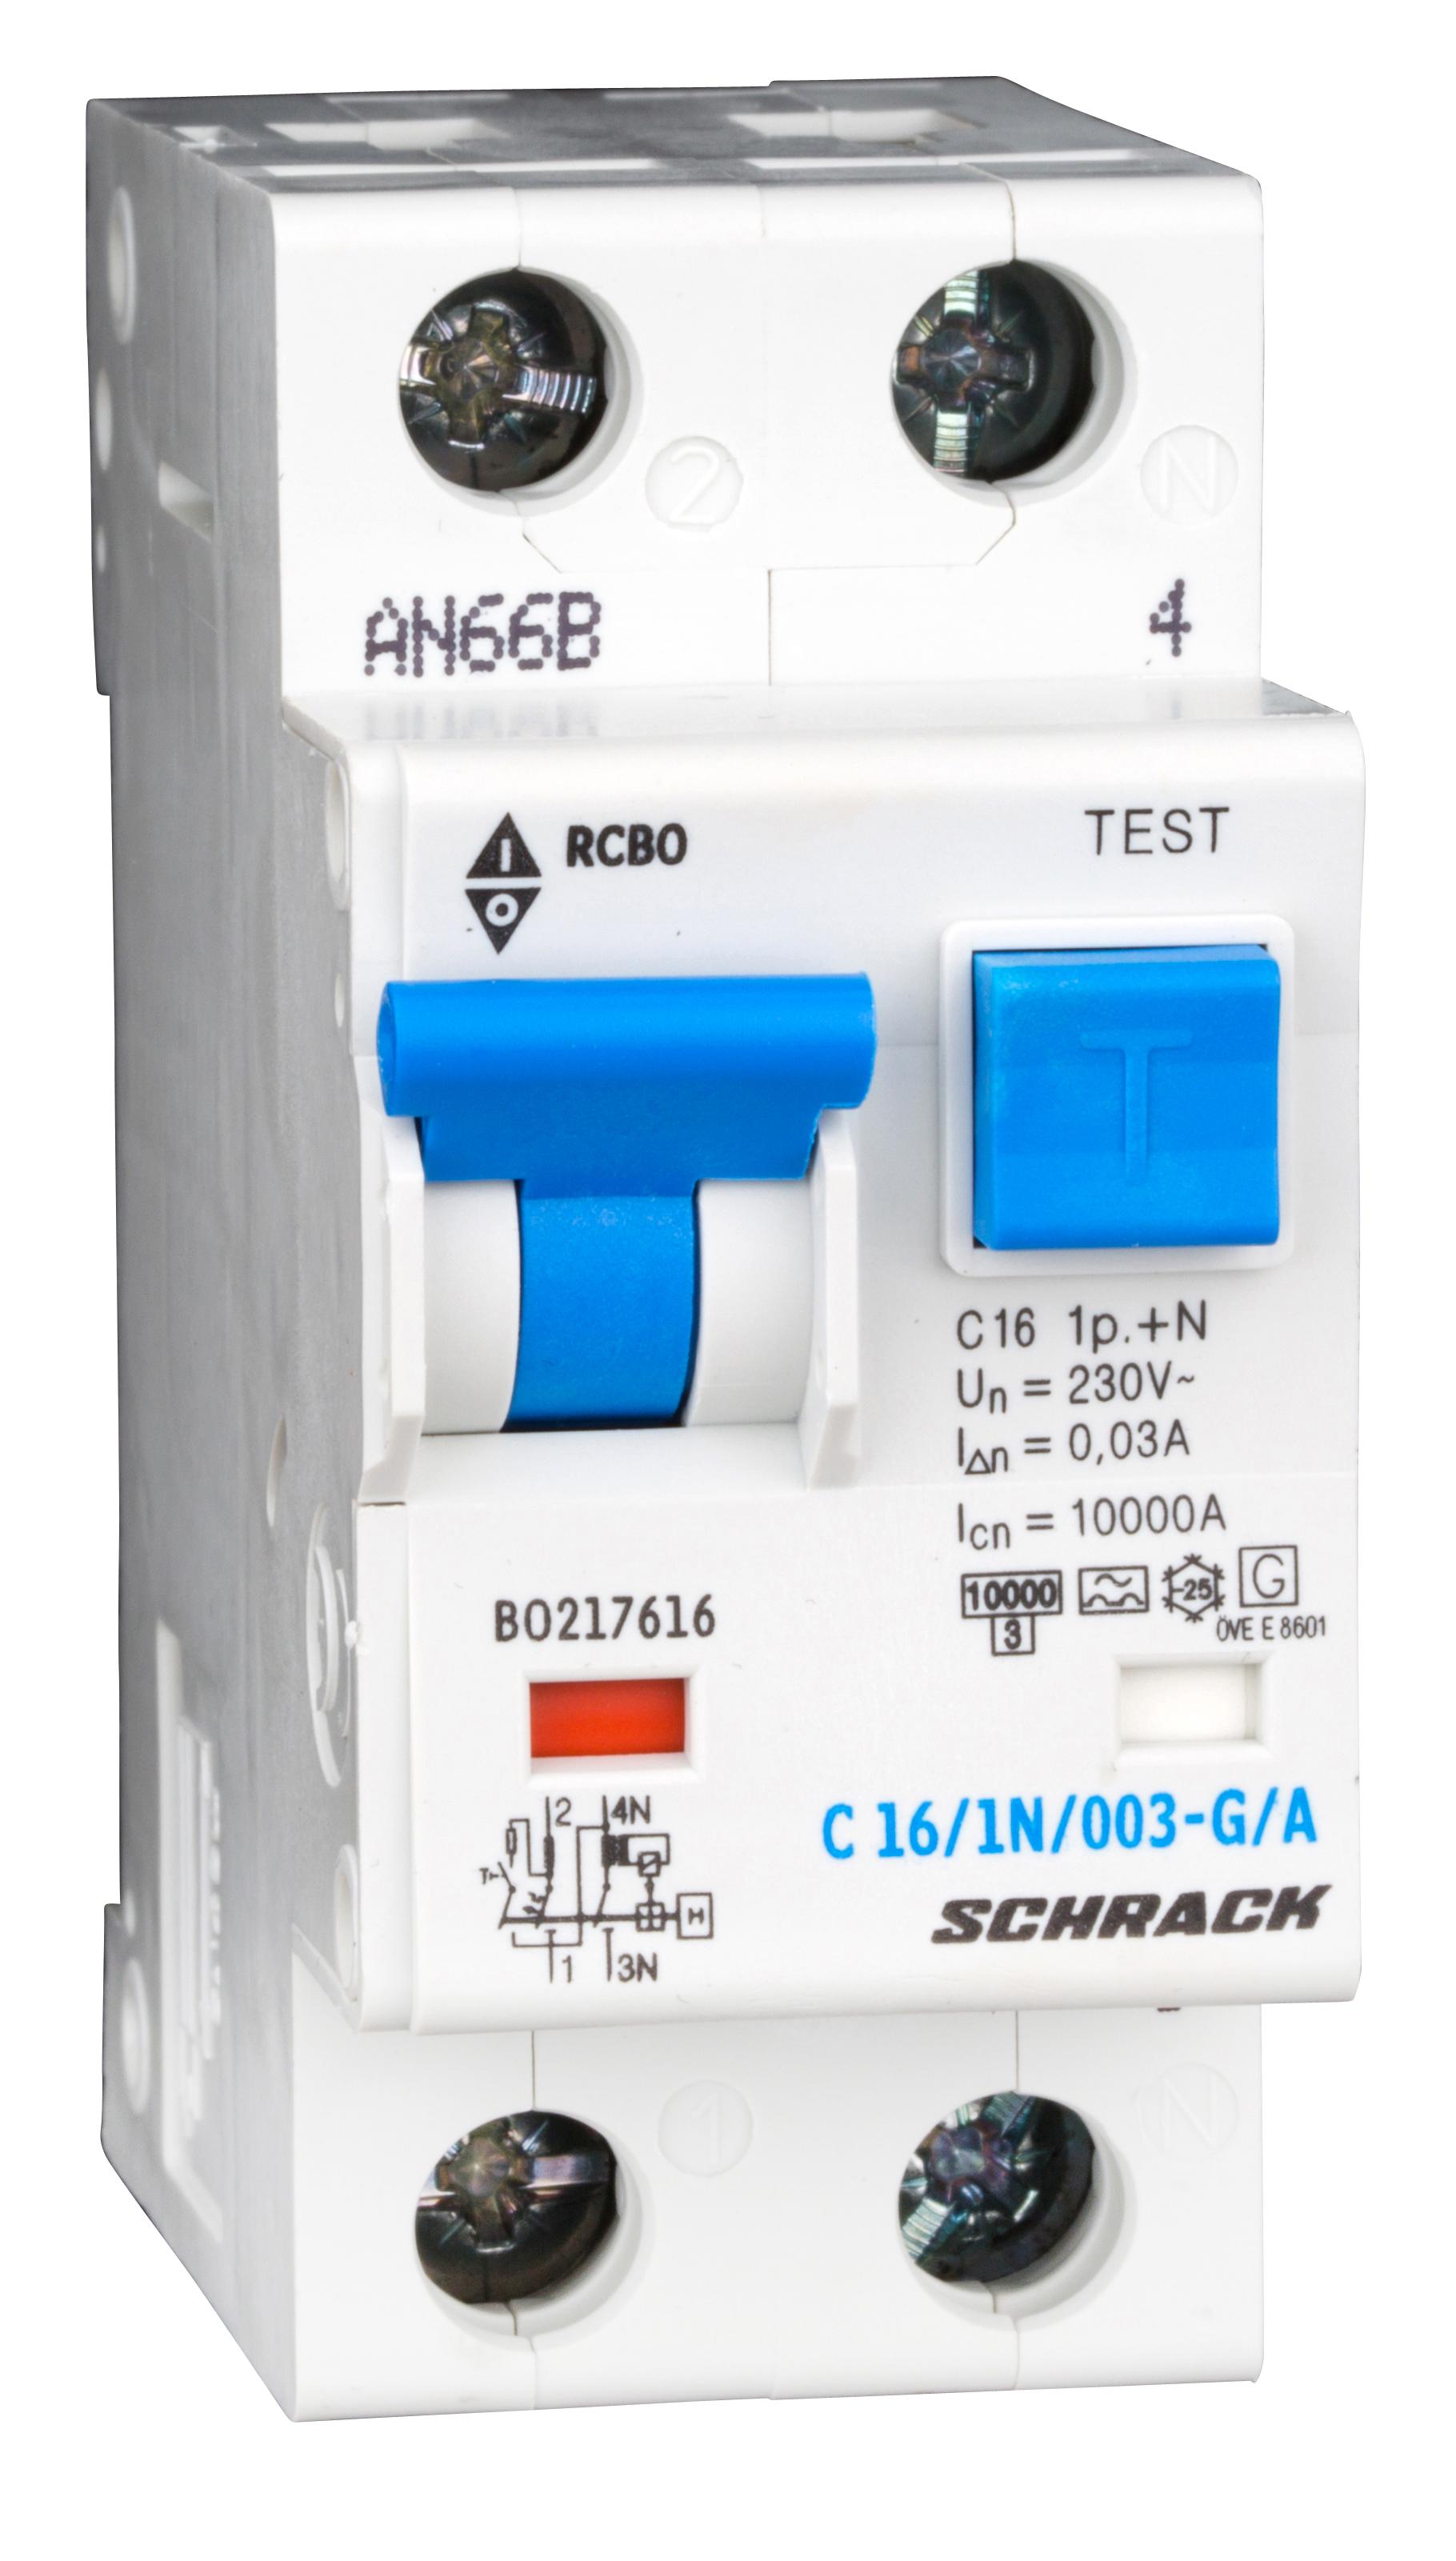 1 Stk LS-FI-Schalter,Kennl.C,32A,30mA,1-polig+N, Bauart G,Typ A BO217632--